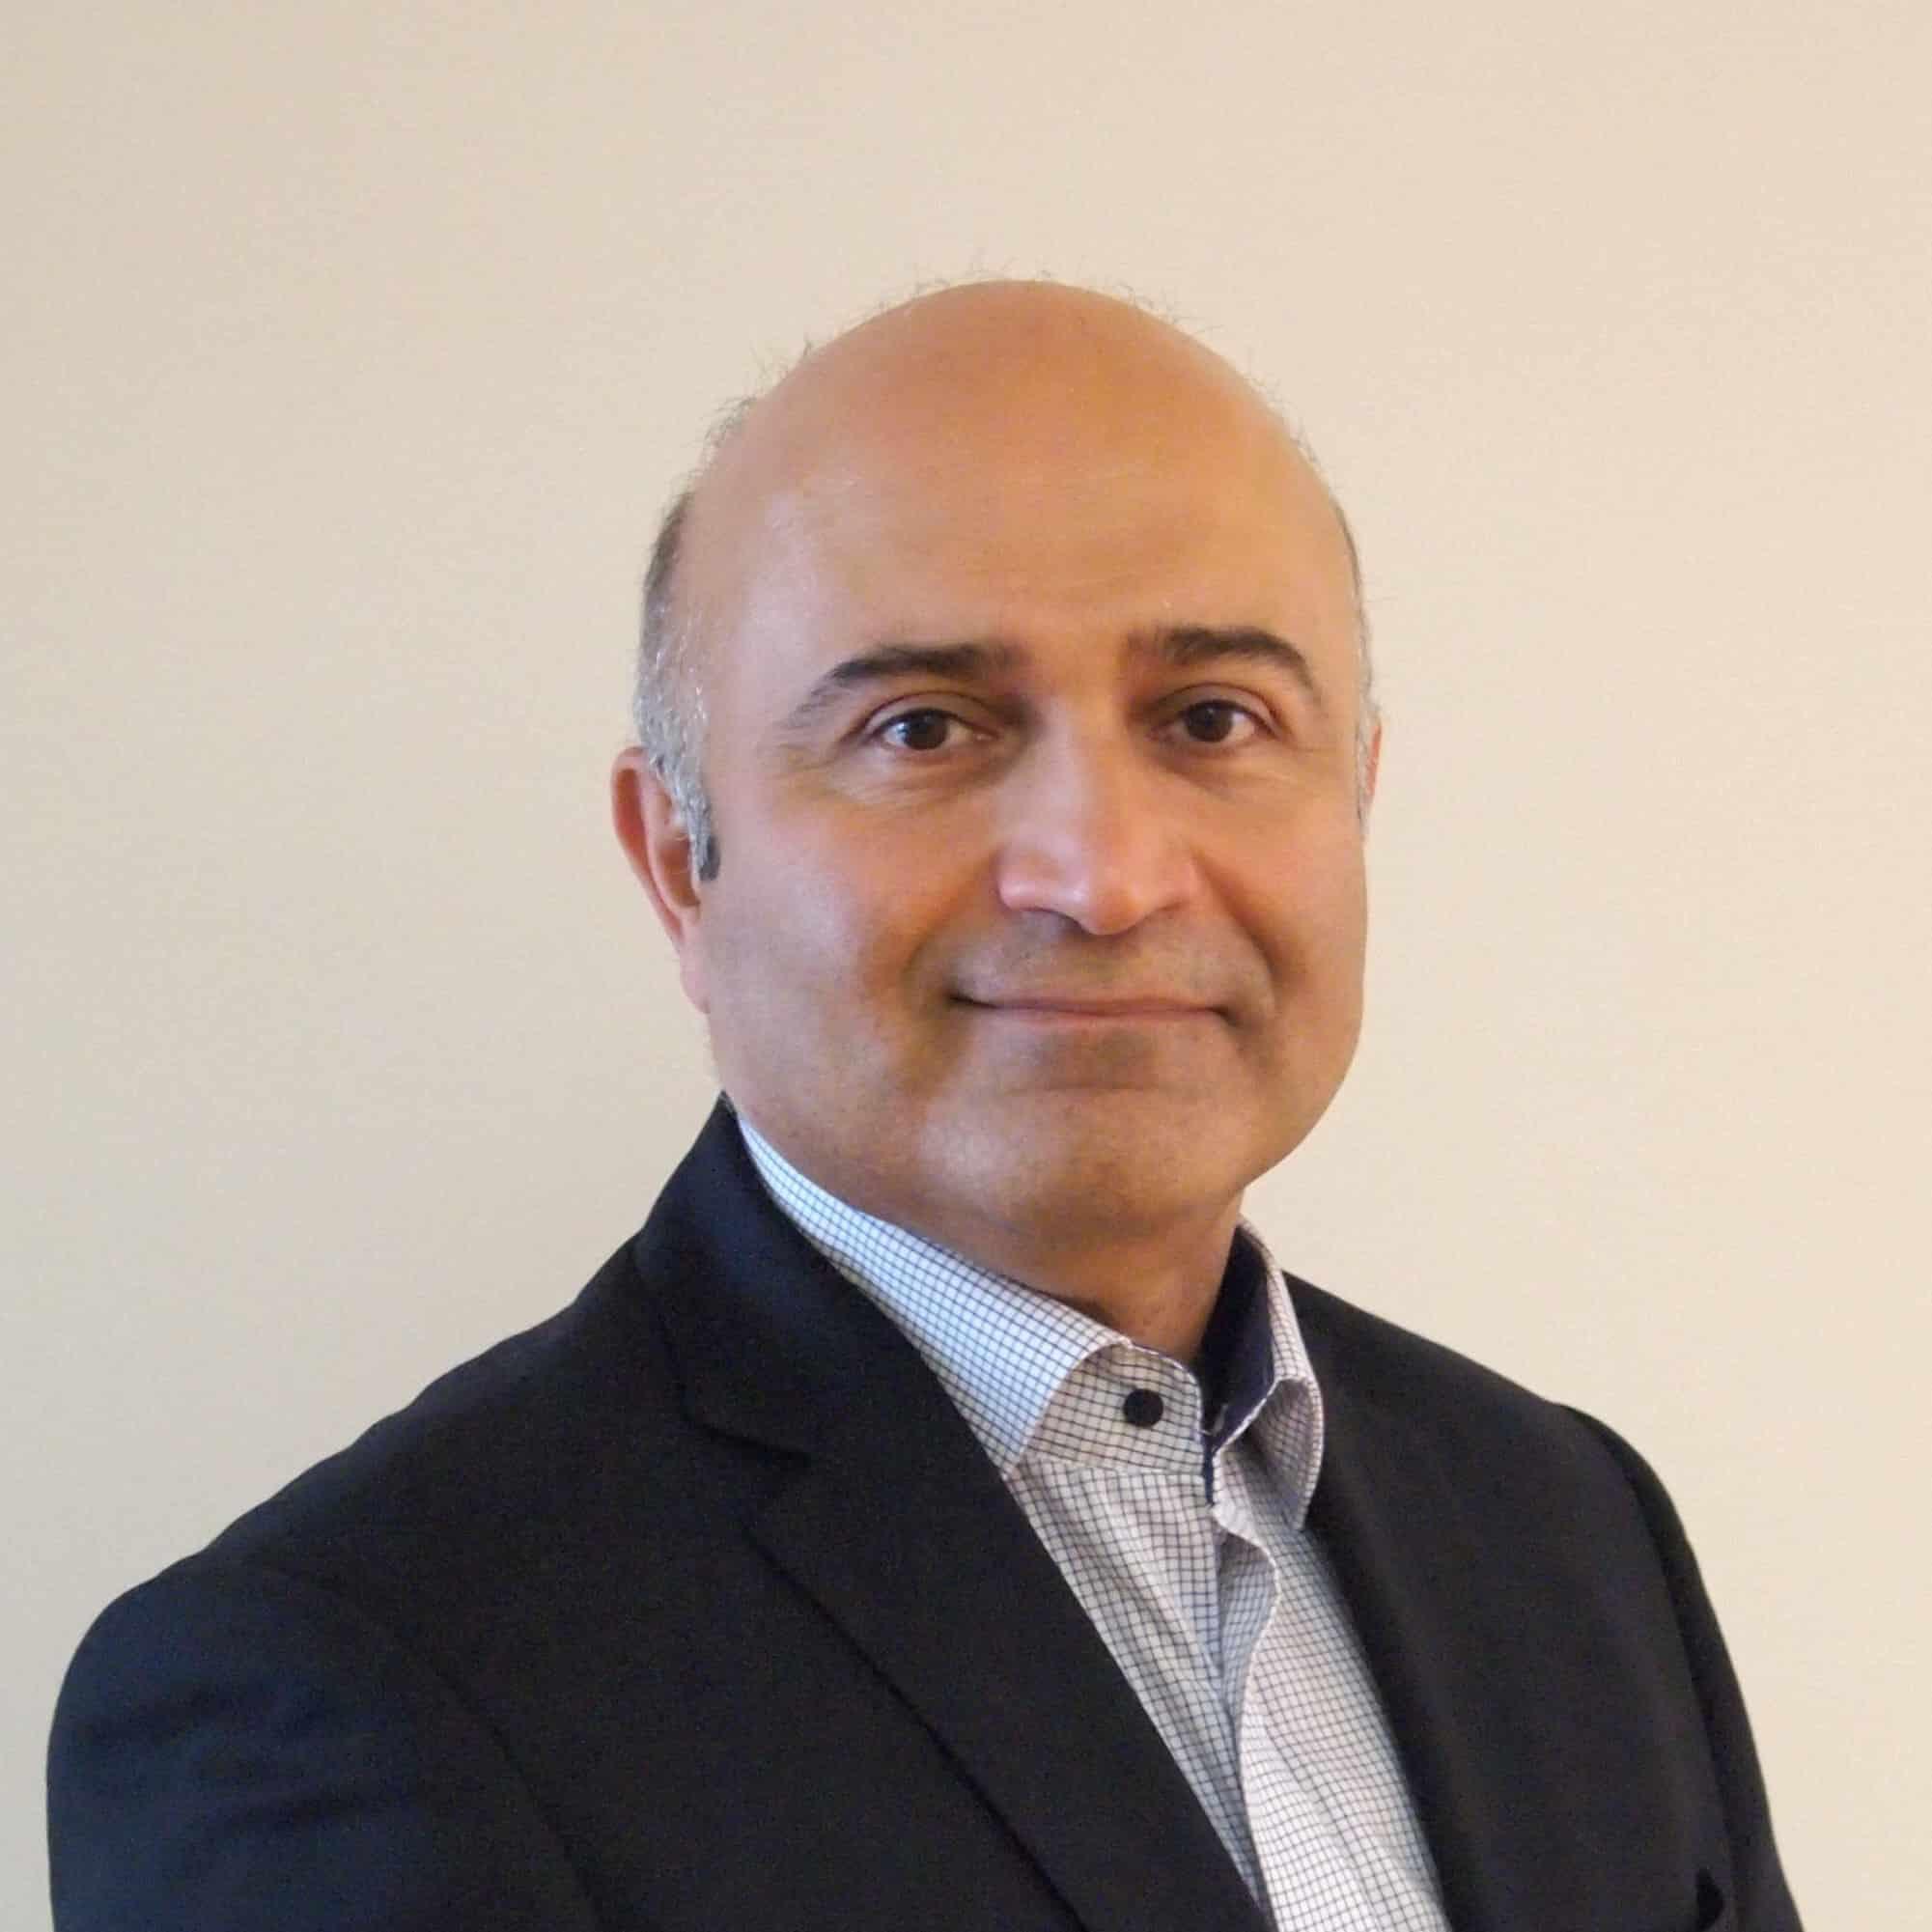 Mohsen Ekssir